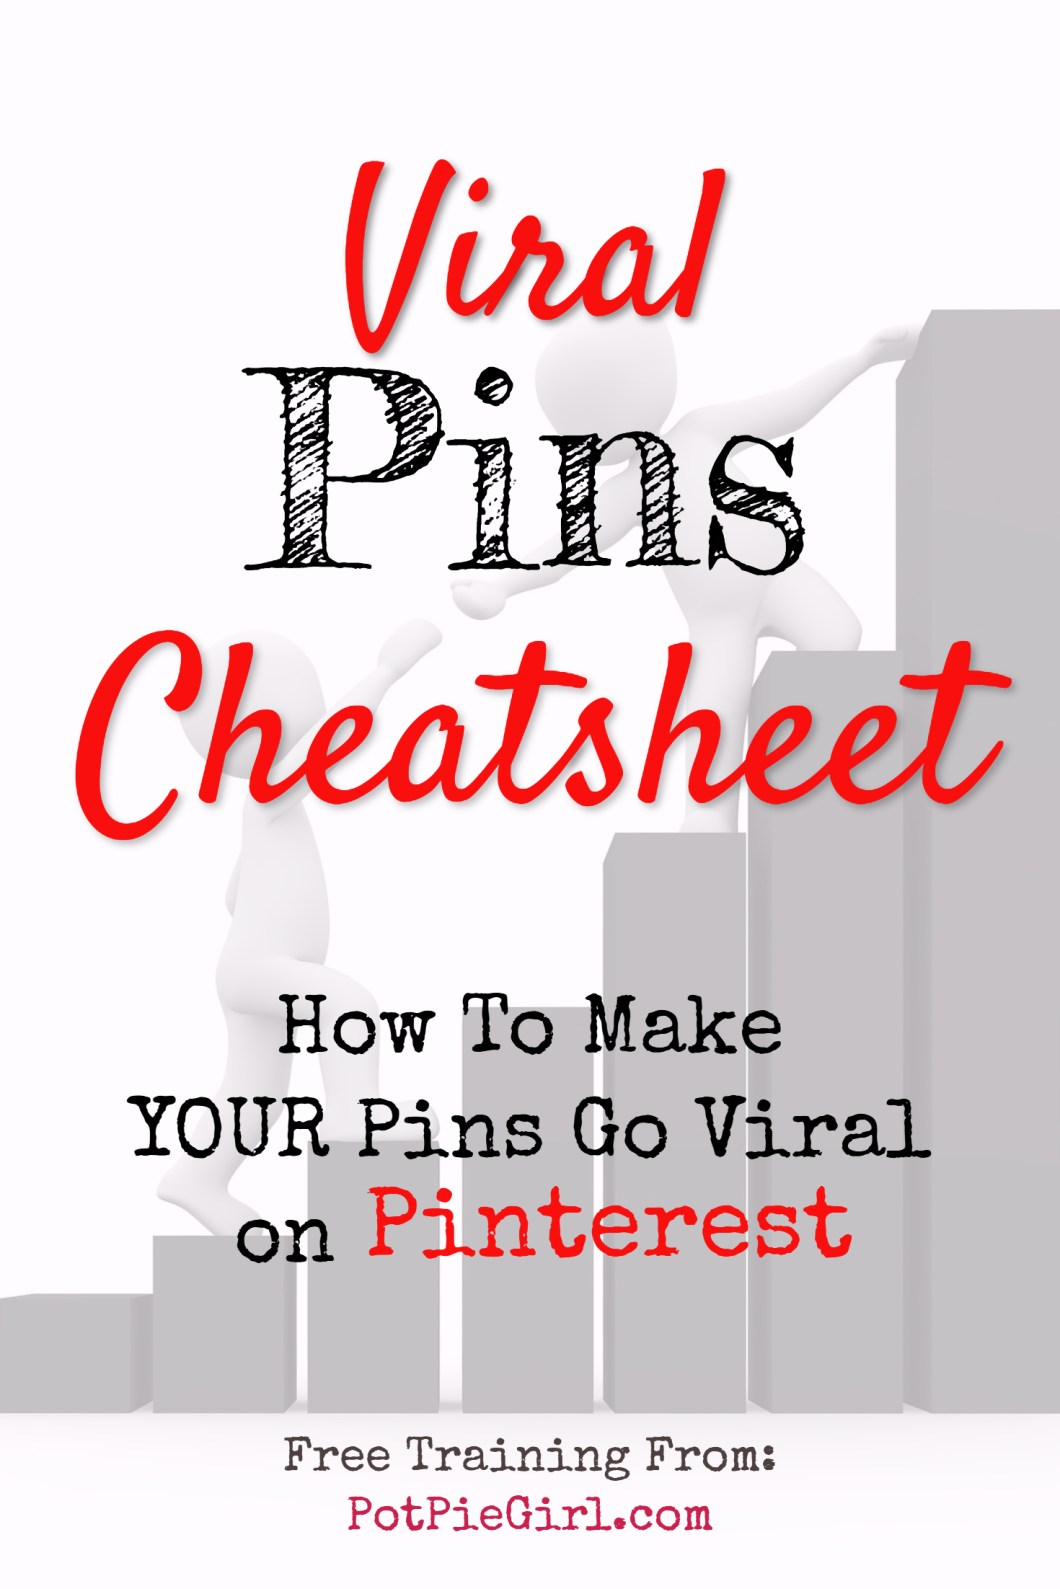 How to make YOUR Pins go VIRAL on Pinterest - free Cheatsheet from @PotPieGirl